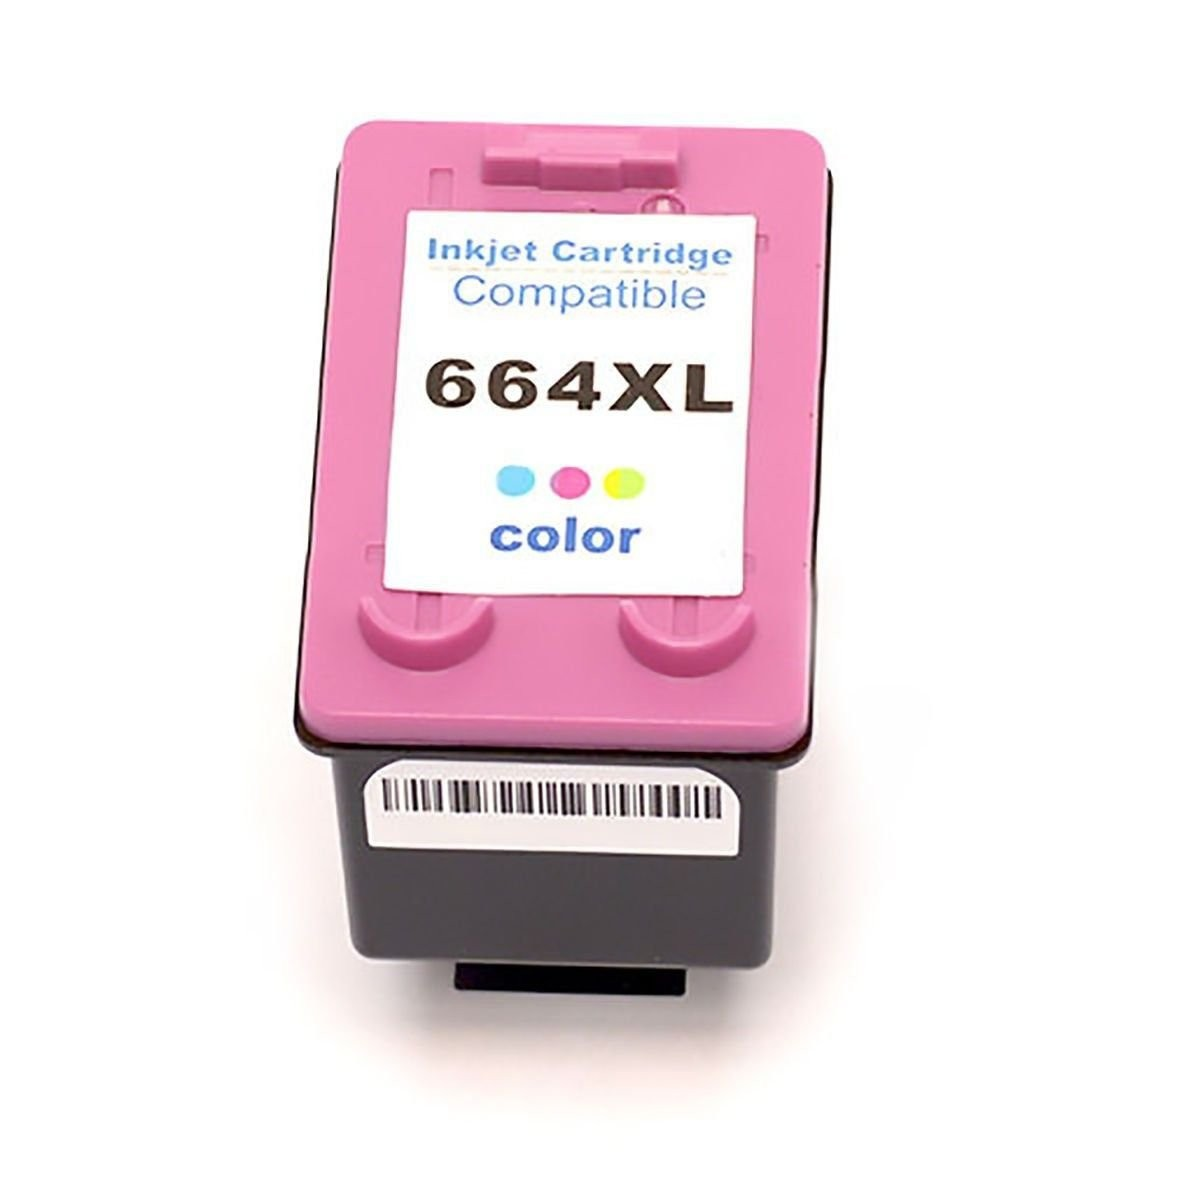 Foto 1 - HP 664XL  Cartucho Compatível  18ml   Cor: Color   Série 3000